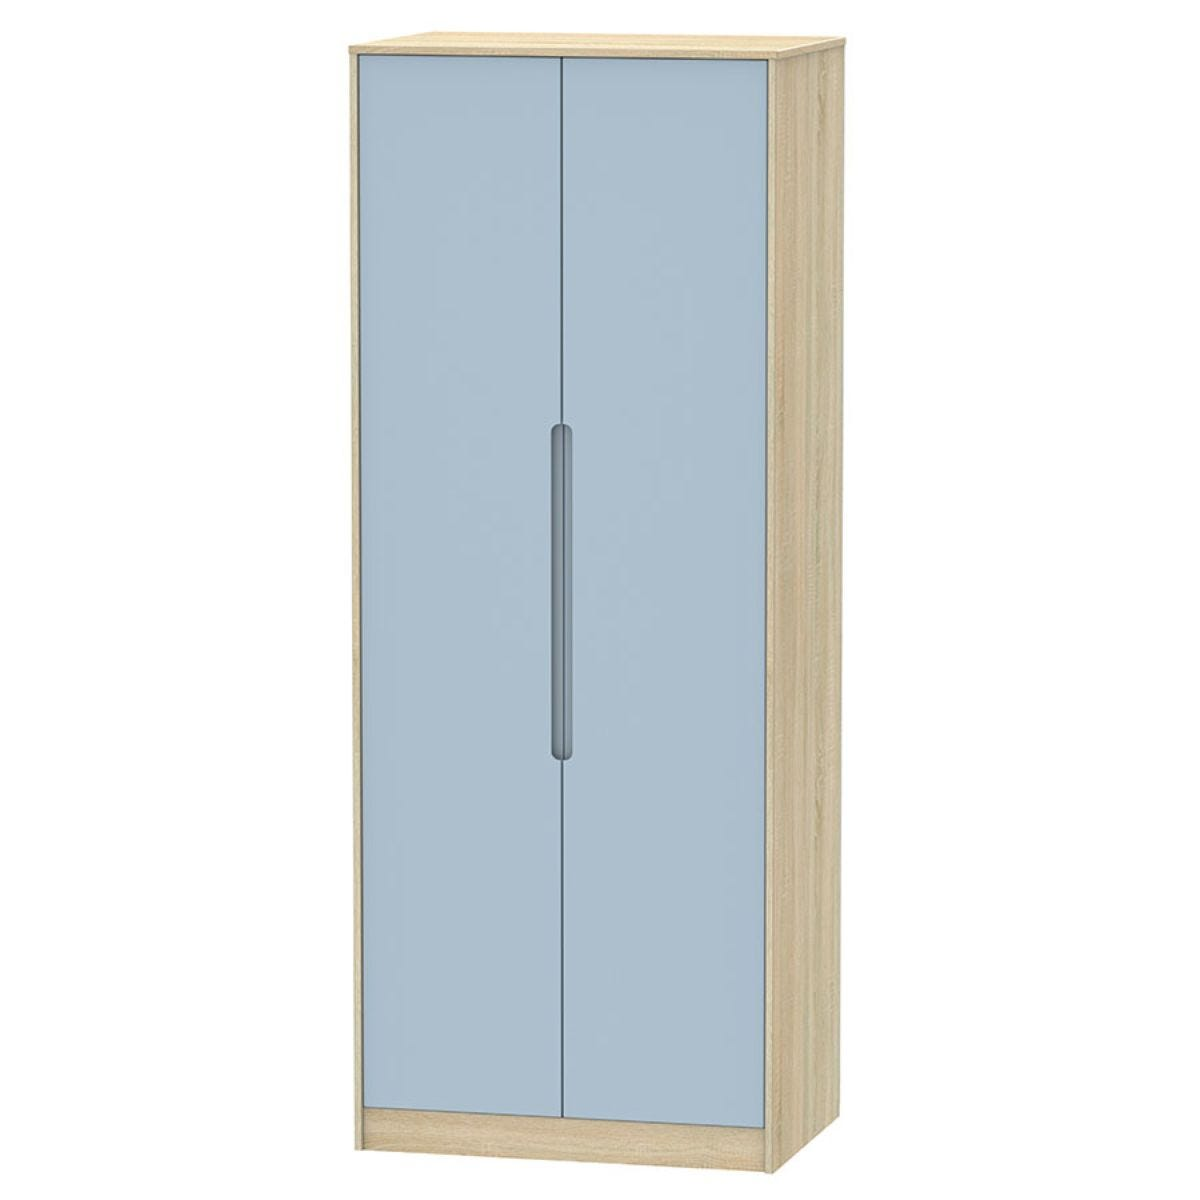 Barquero Tall 2-Door Wardrobe - Pine/Denim